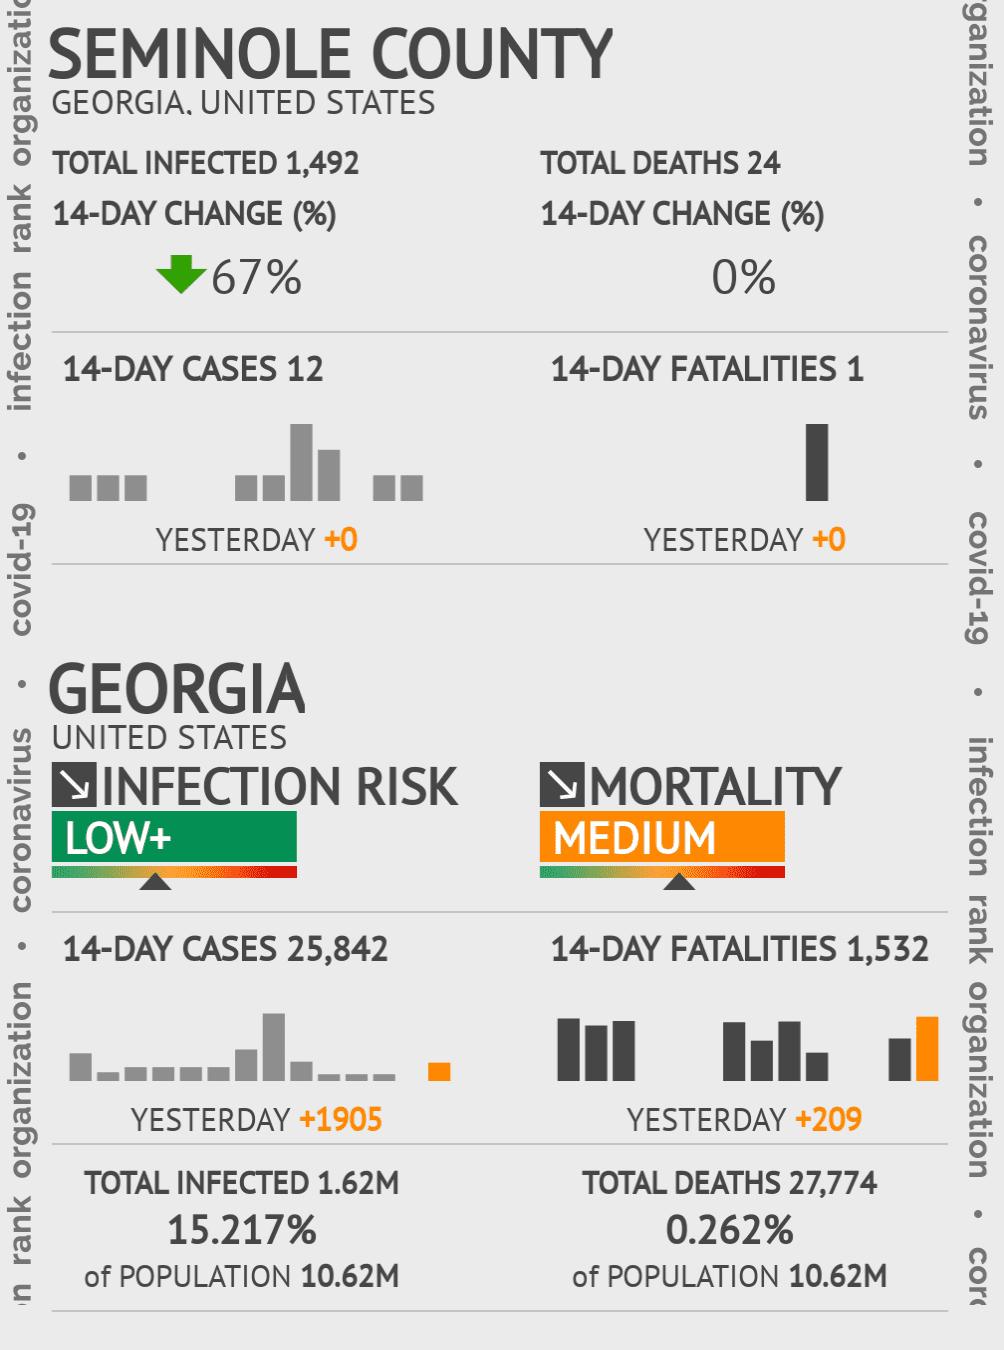 Seminole County Coronavirus Covid-19 Risk of Infection on March 23, 2021